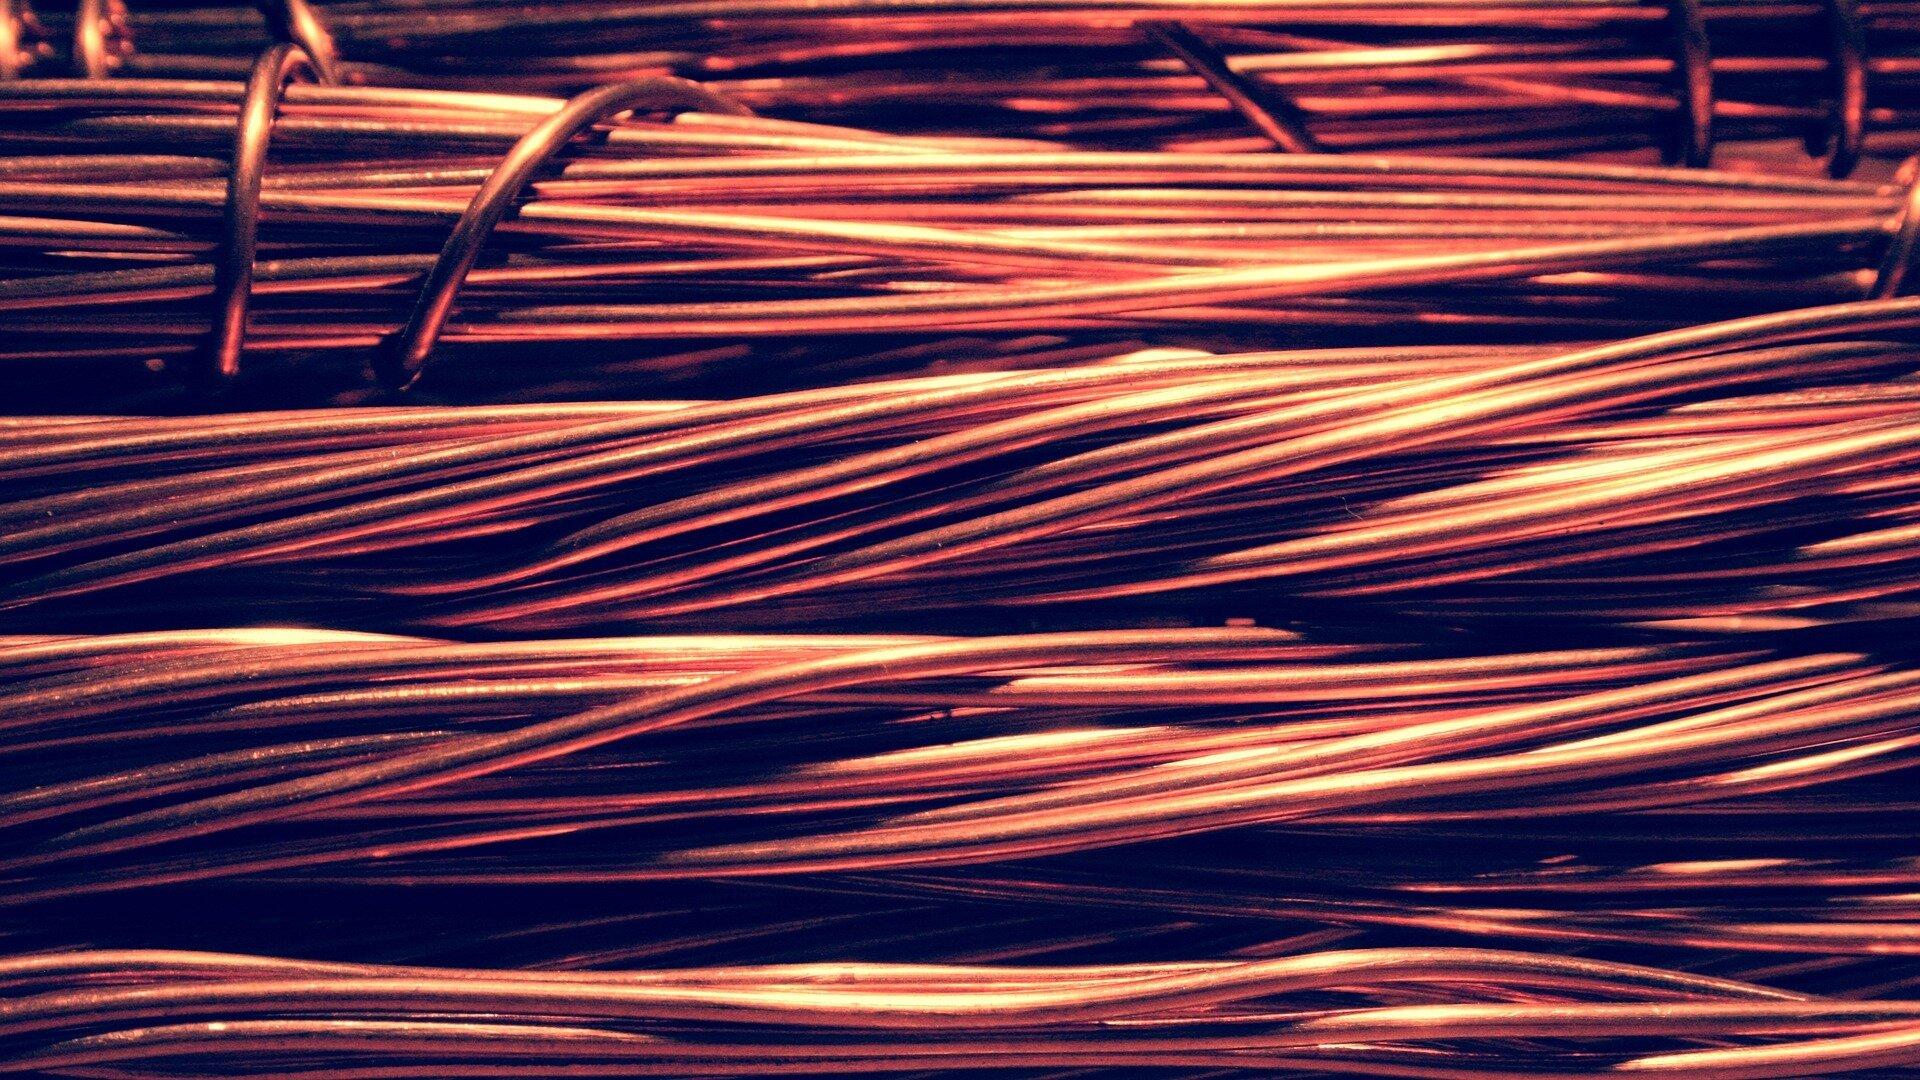 A Safer Alternative to Sourcing Copper via Bacteria